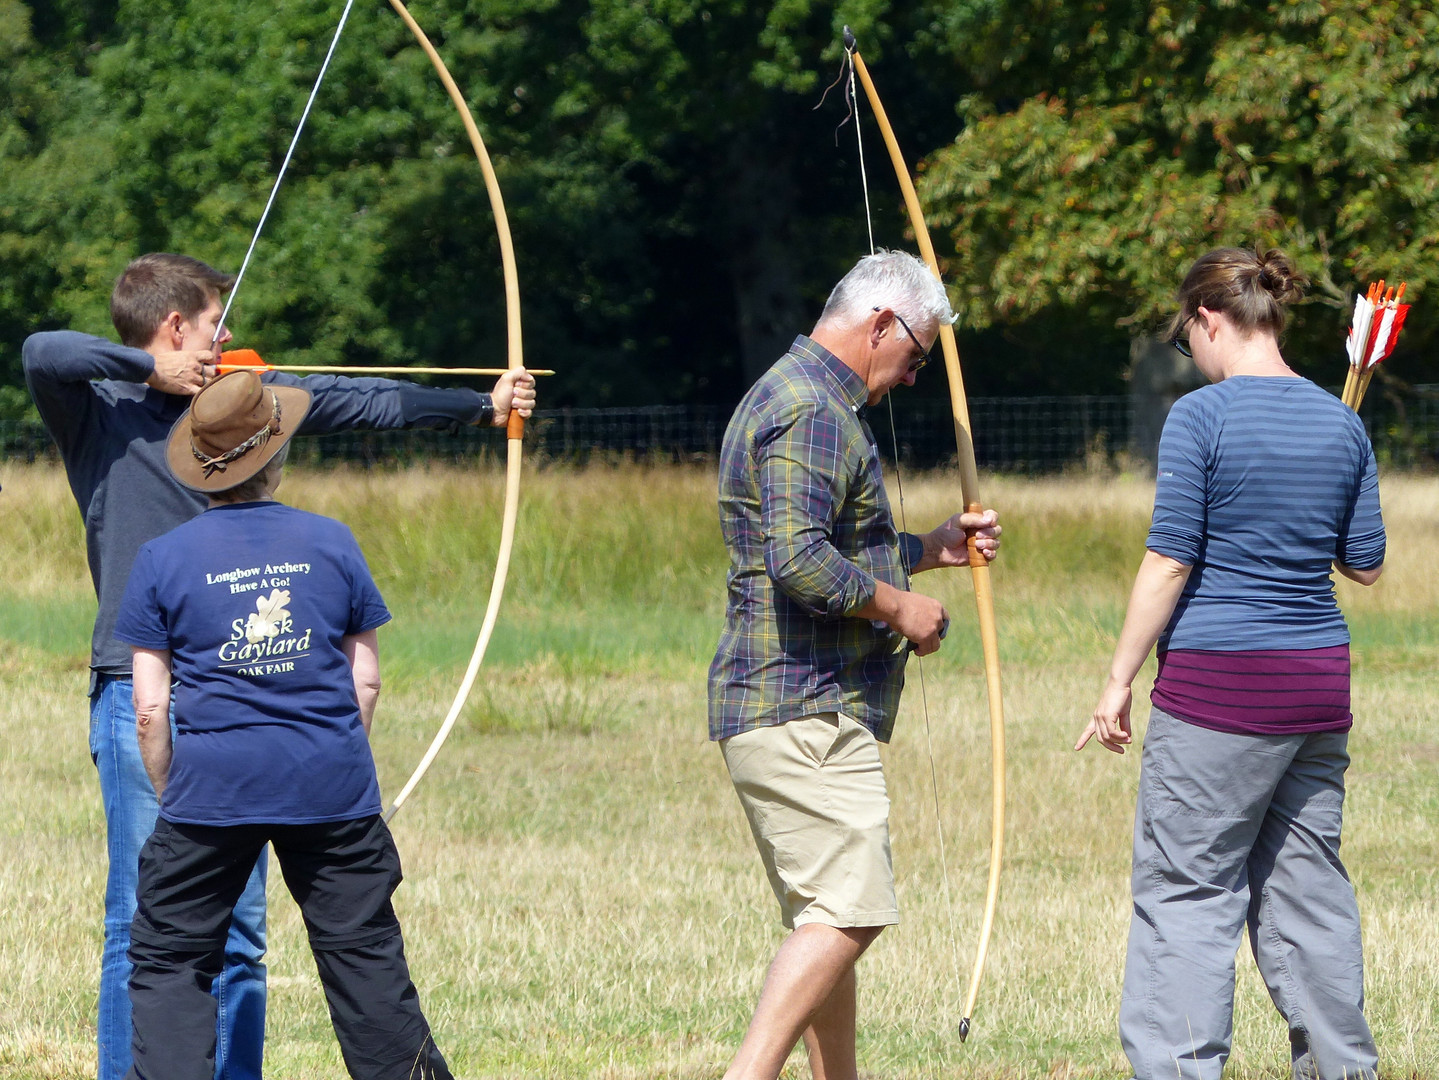 Archery have a go Oak Fair Dorset